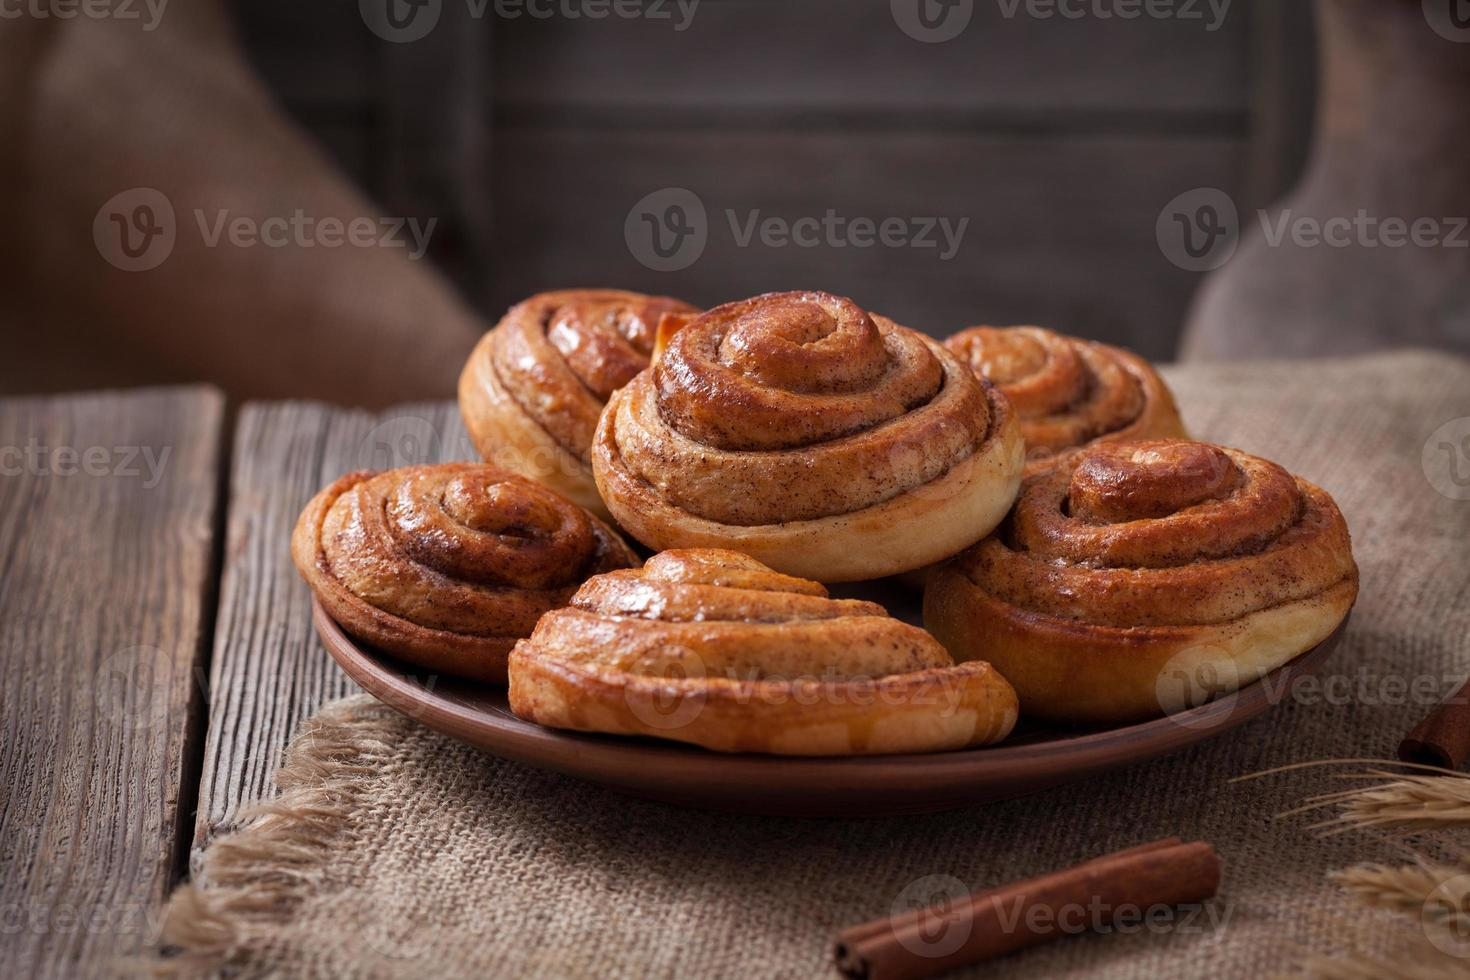 pão de canela doce rola natal caseiro delicioso doce gelado sobremesa foto